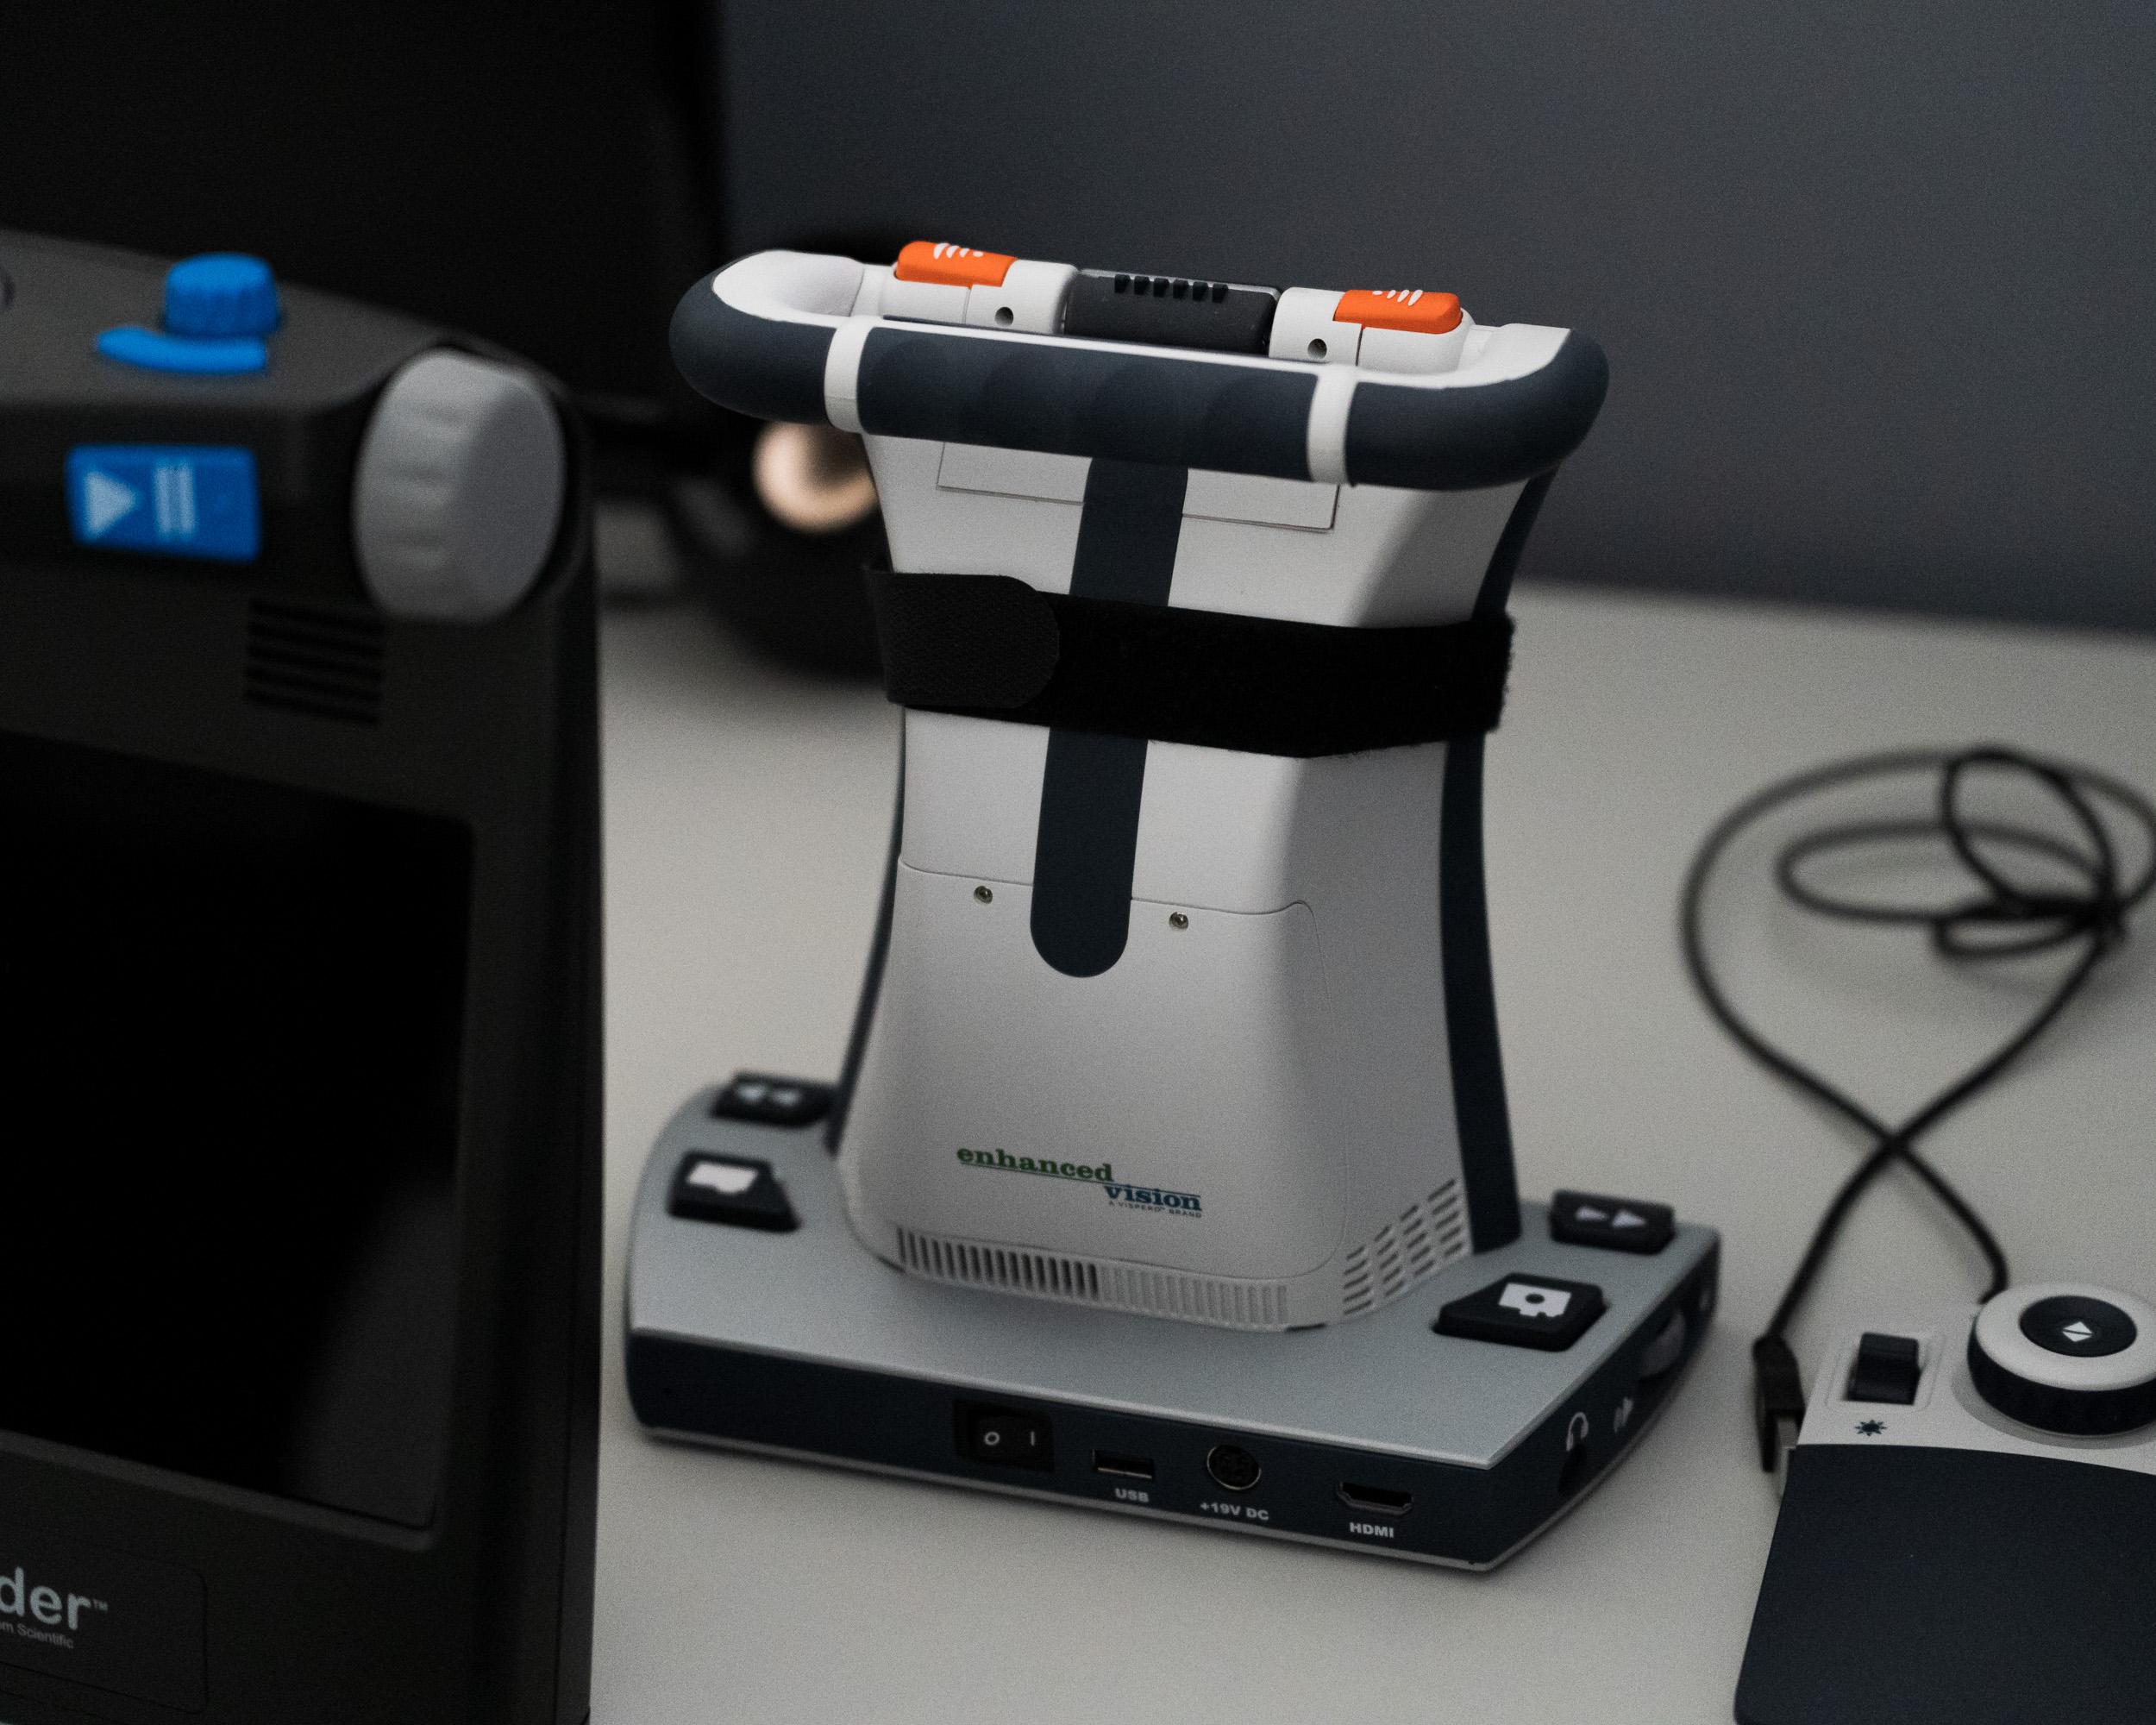 Machinery inside a lab